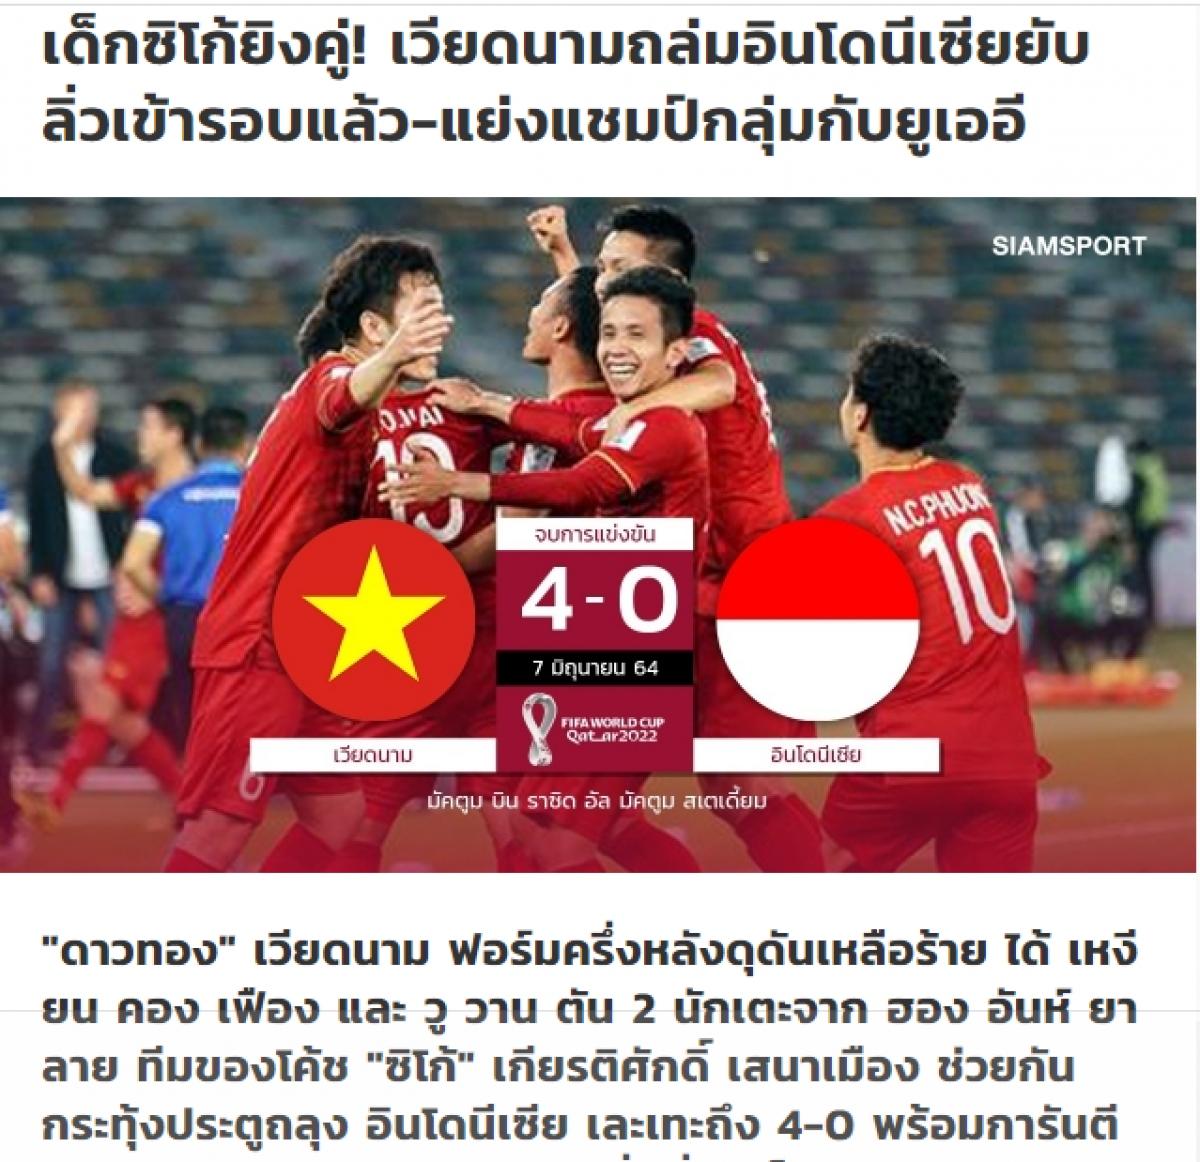 Siam Sport hailsVietnamese victory over Indonesia